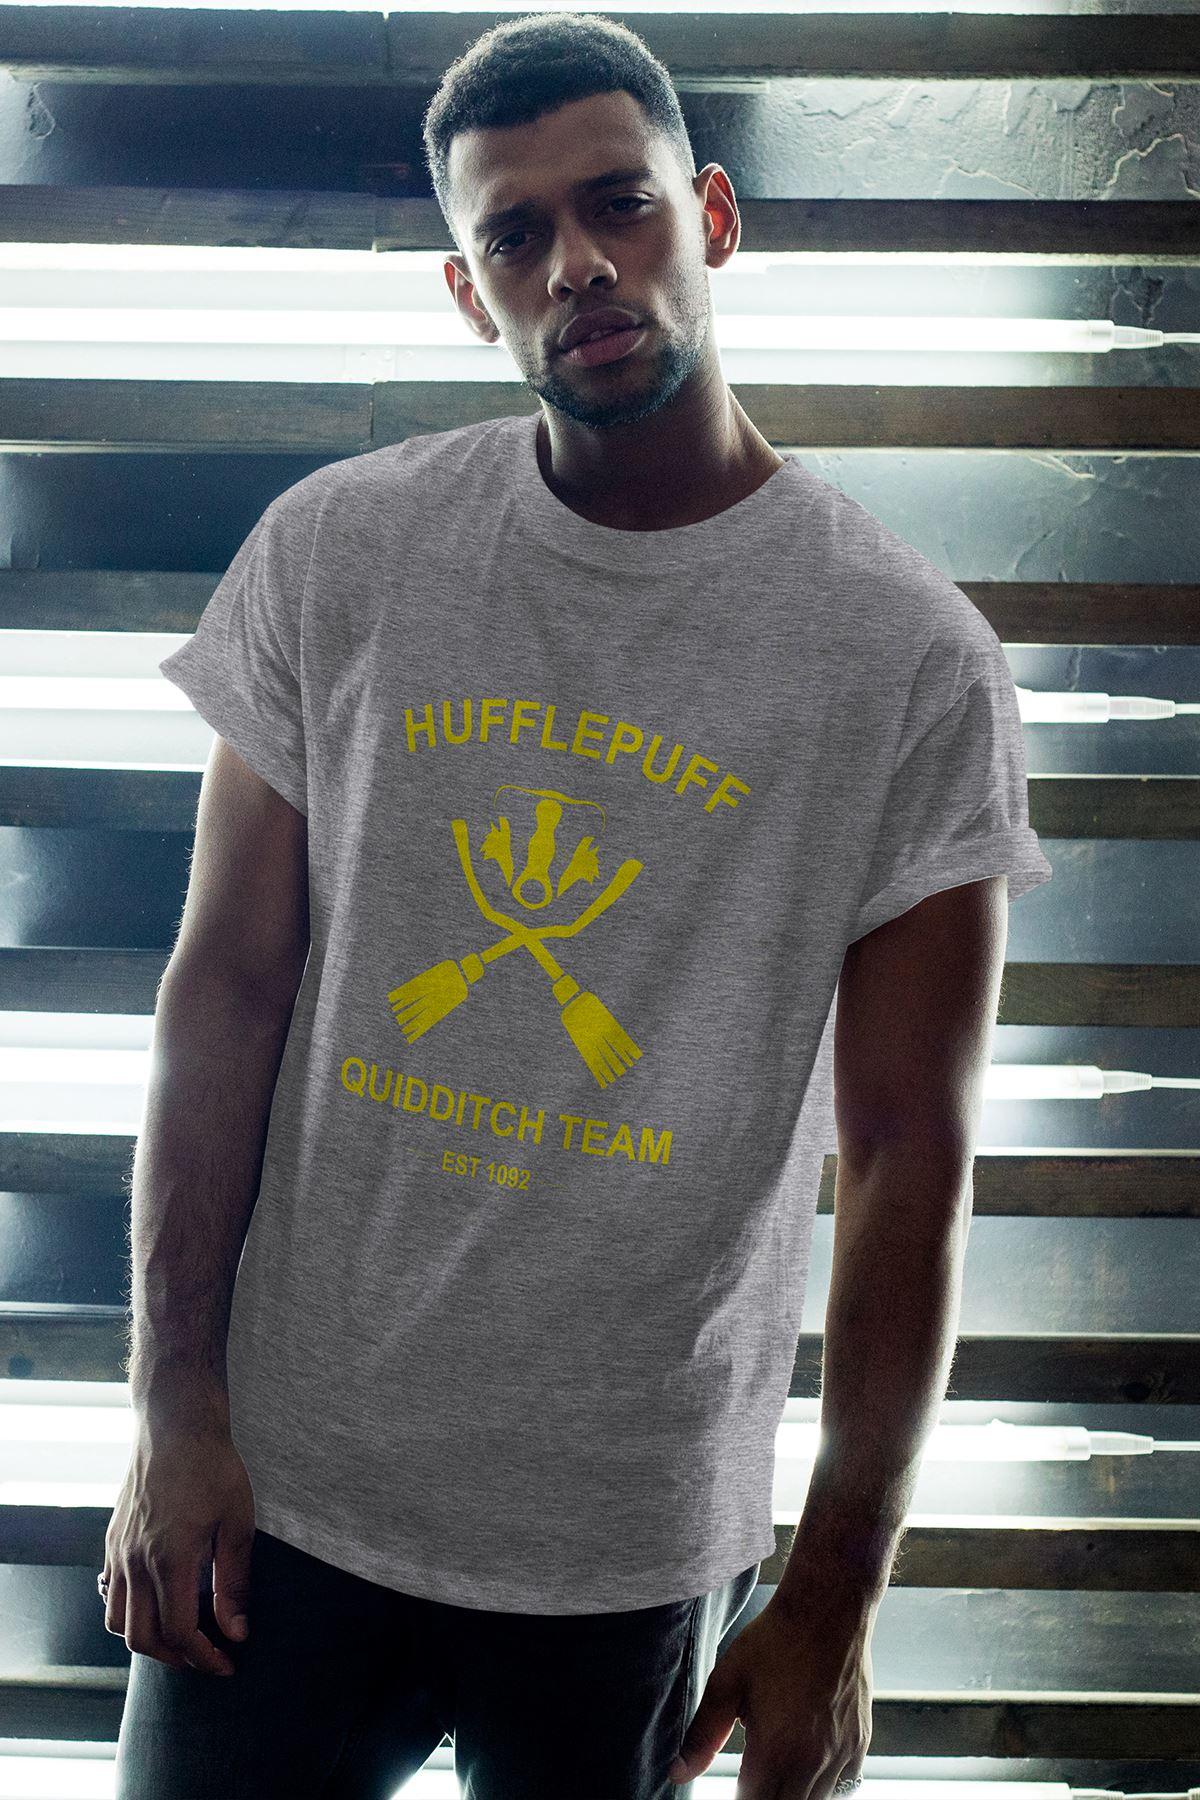 Hufflepuff Gri Erkek Oversize Tshirt - Tişört